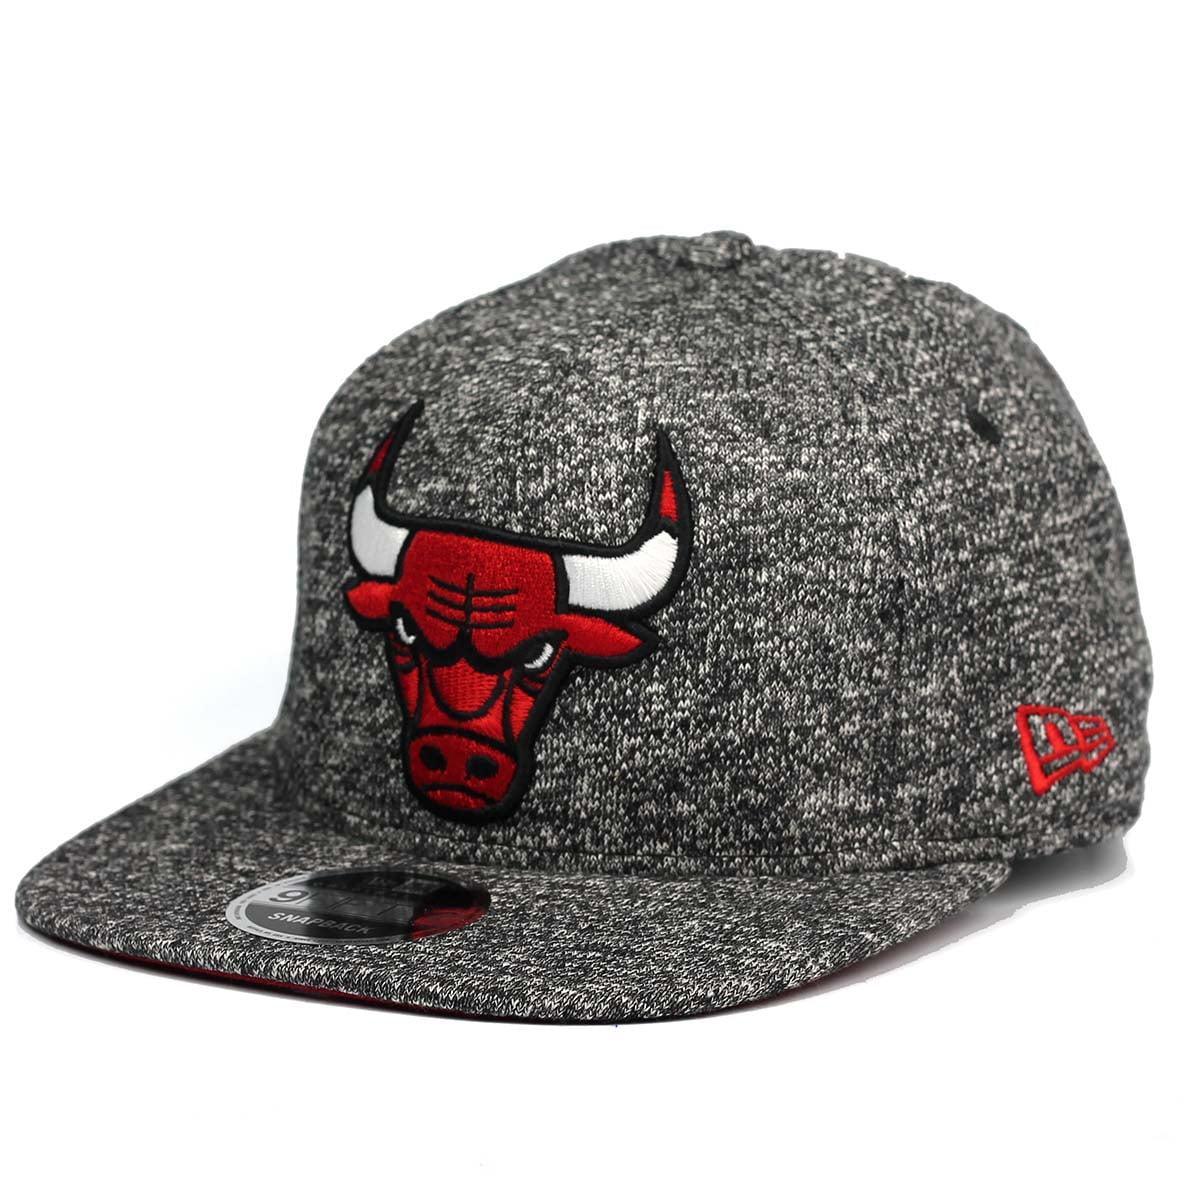 Bone Chicago Bulls New Era 9fifty black french